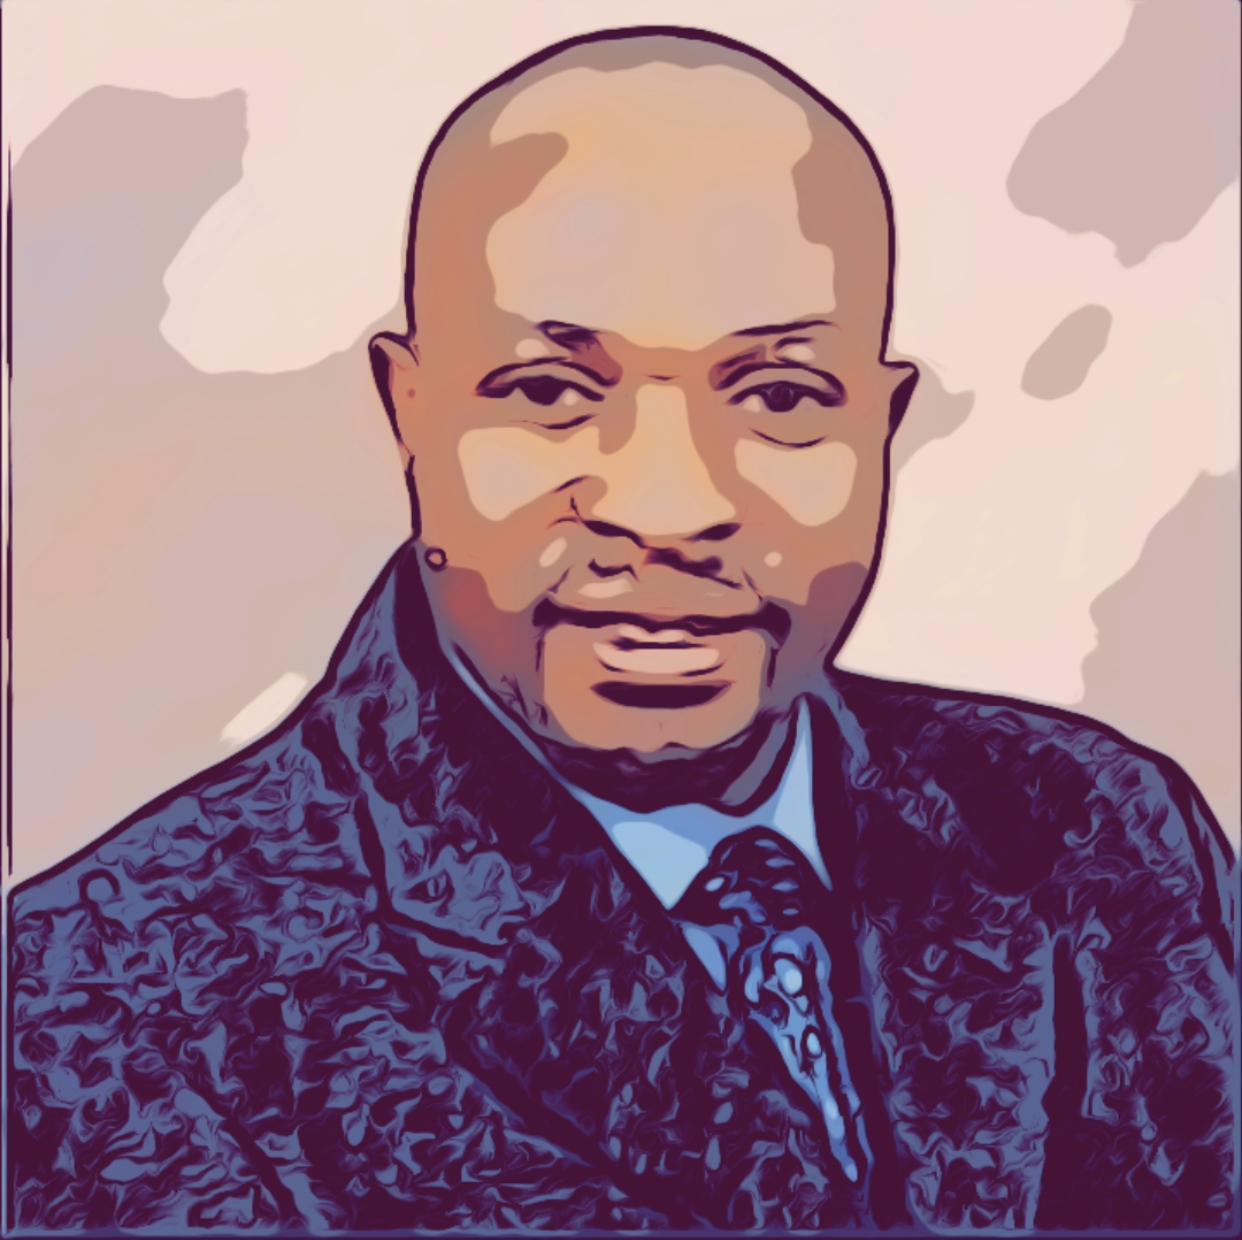 Mr Abdulhakeen Alao Tijjani, CEO, Aspuna Nigeria.